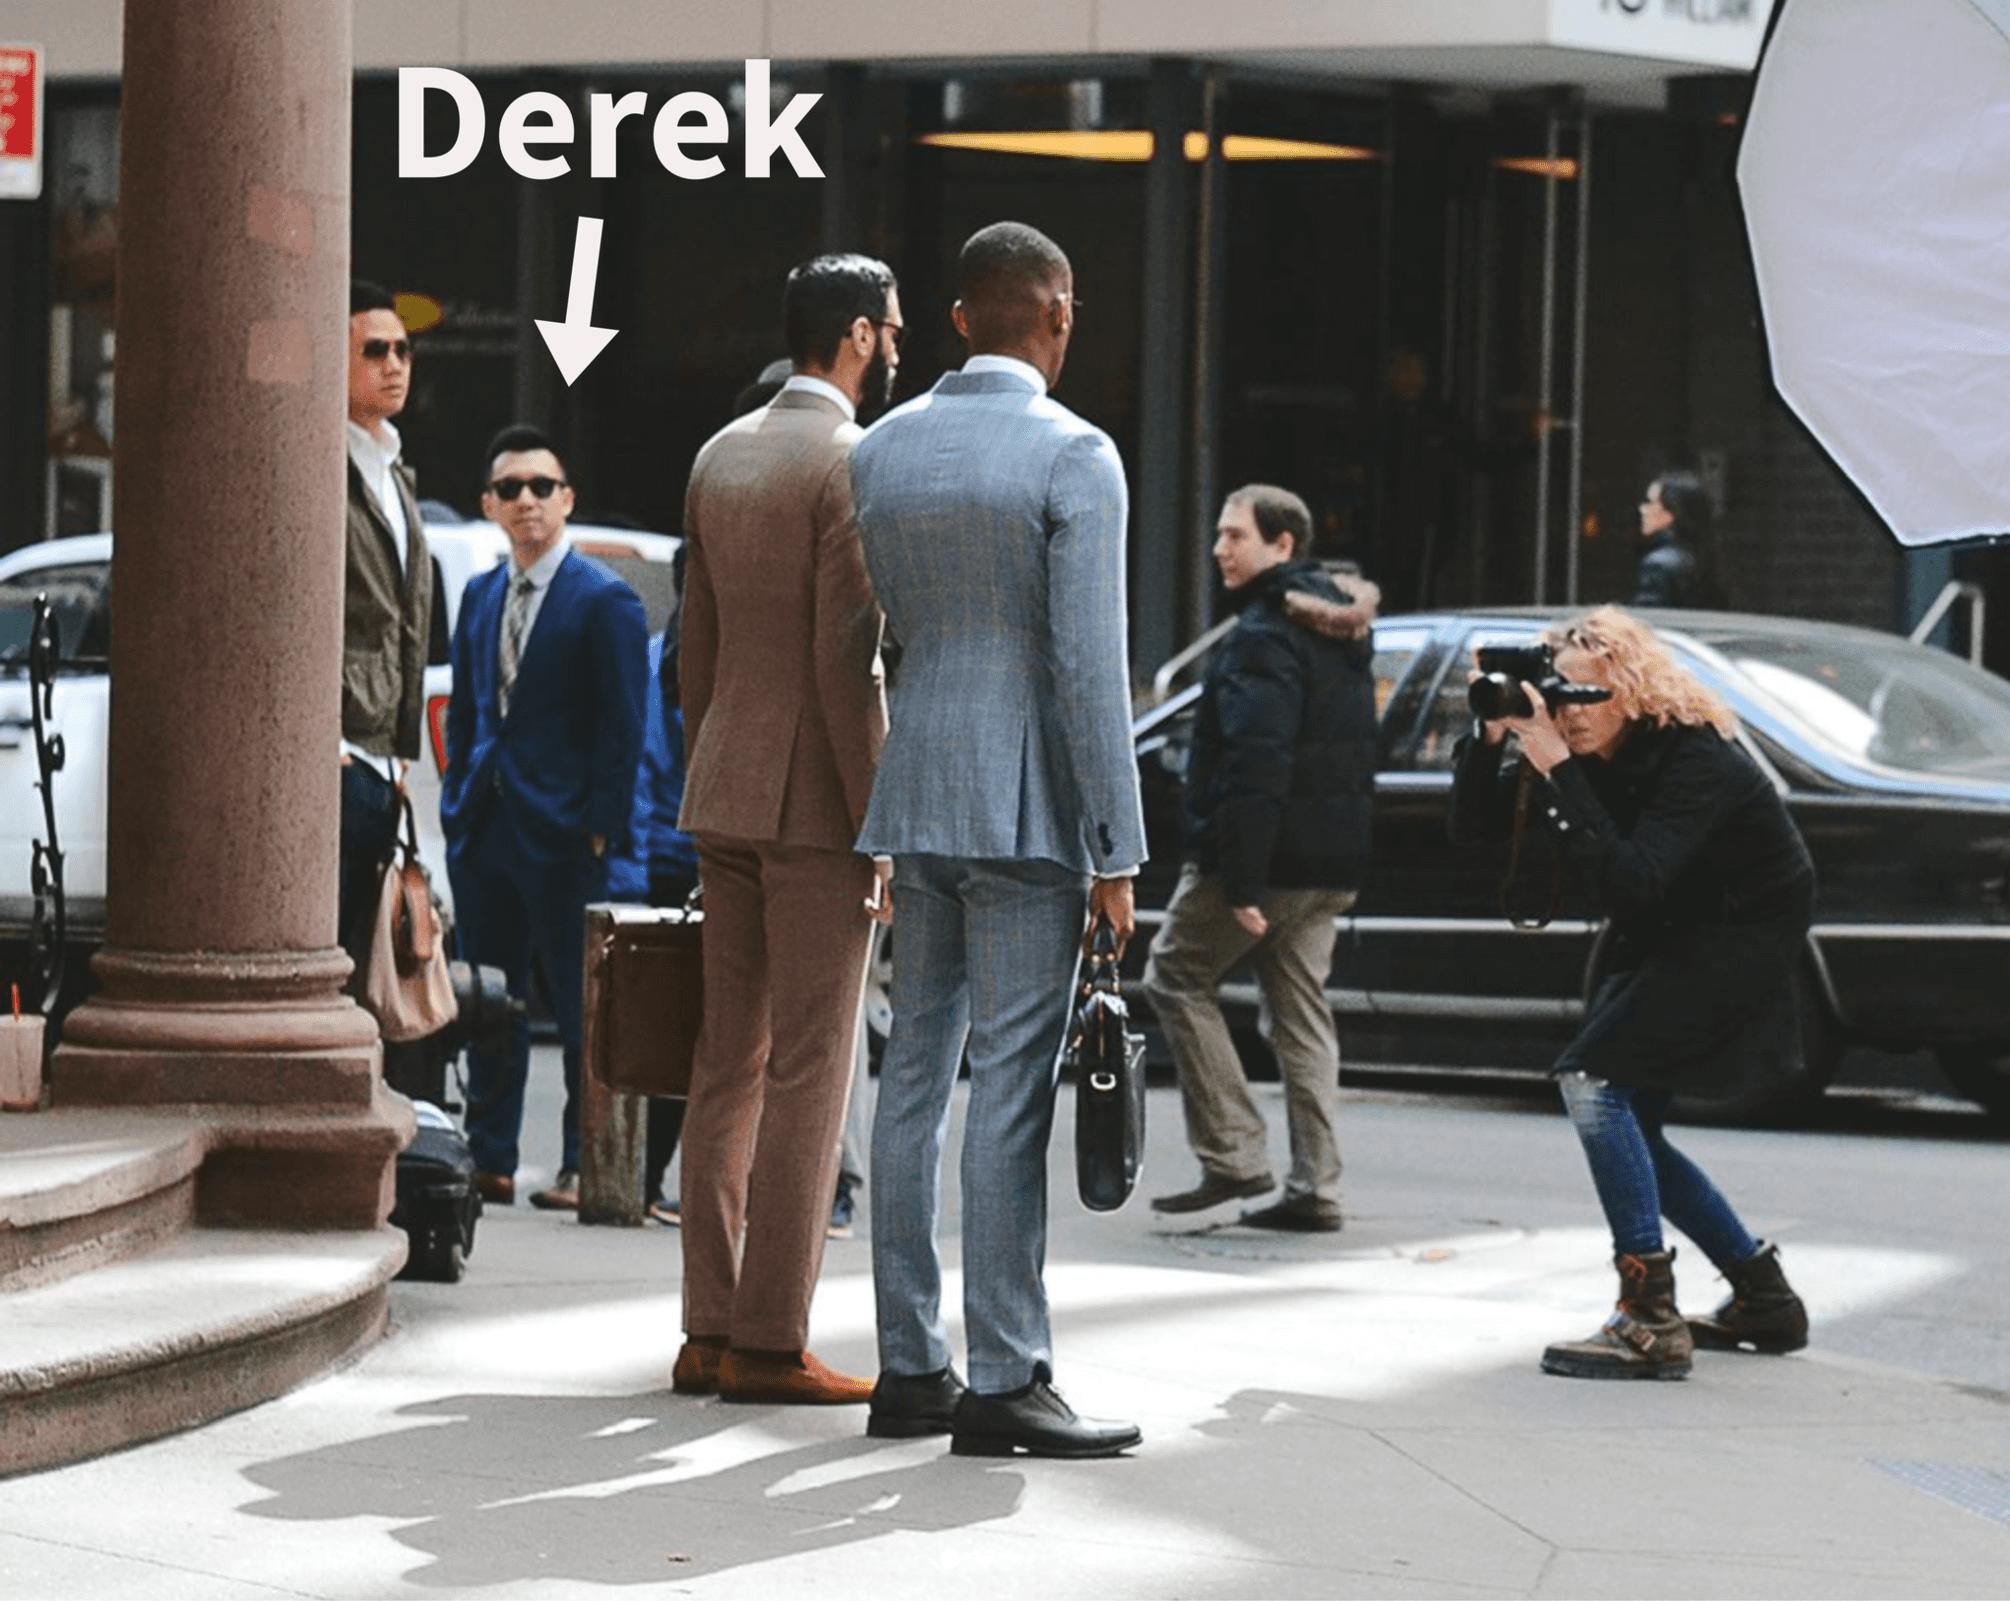 Derek Tian